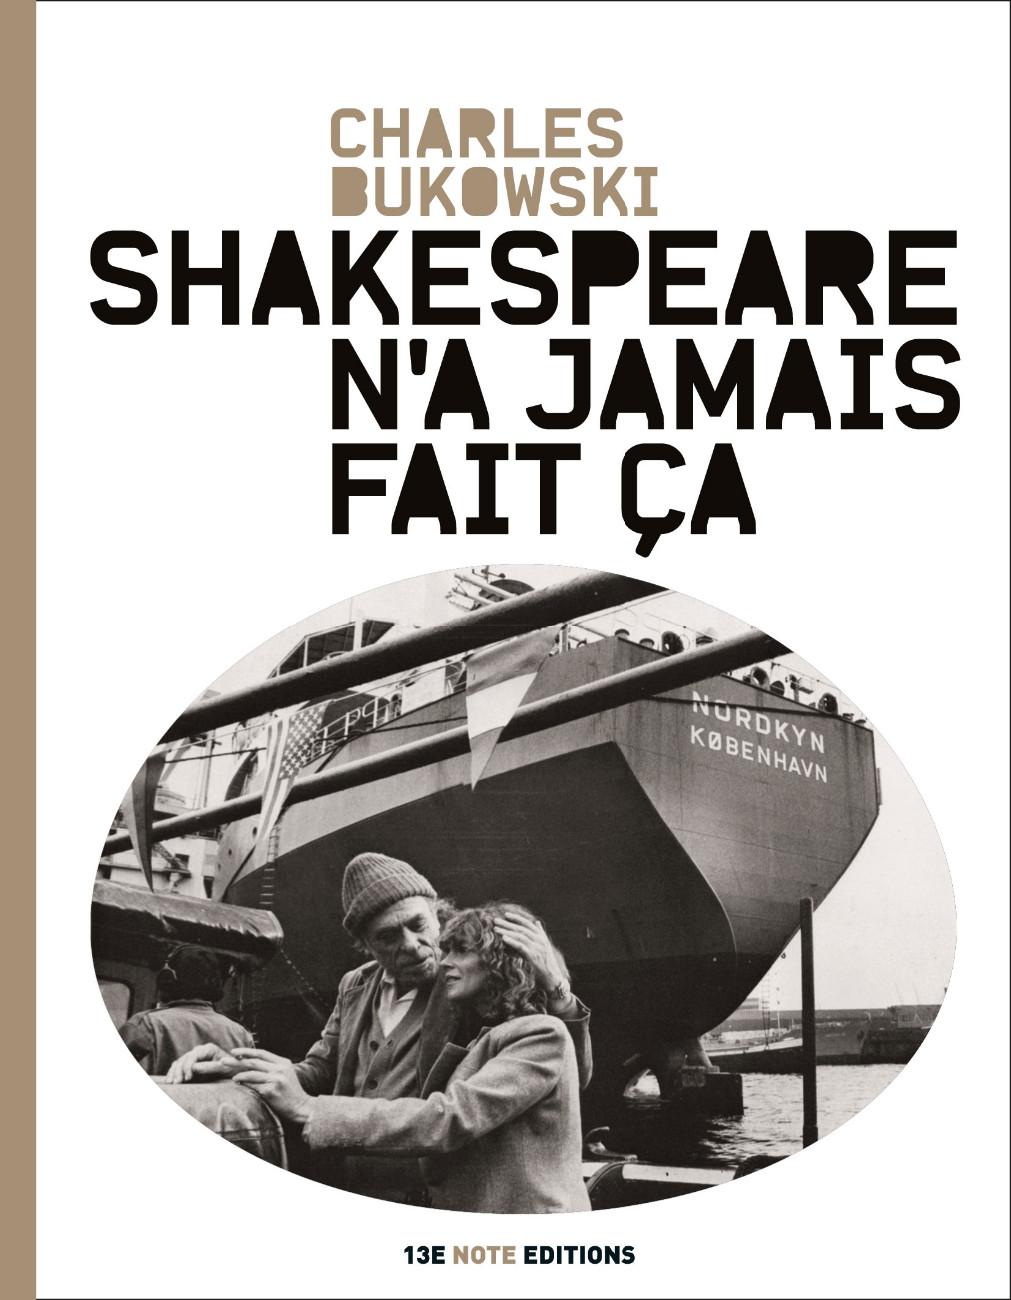 Charles Bukowski - Shakespeare N'a Jamais Fait Ça